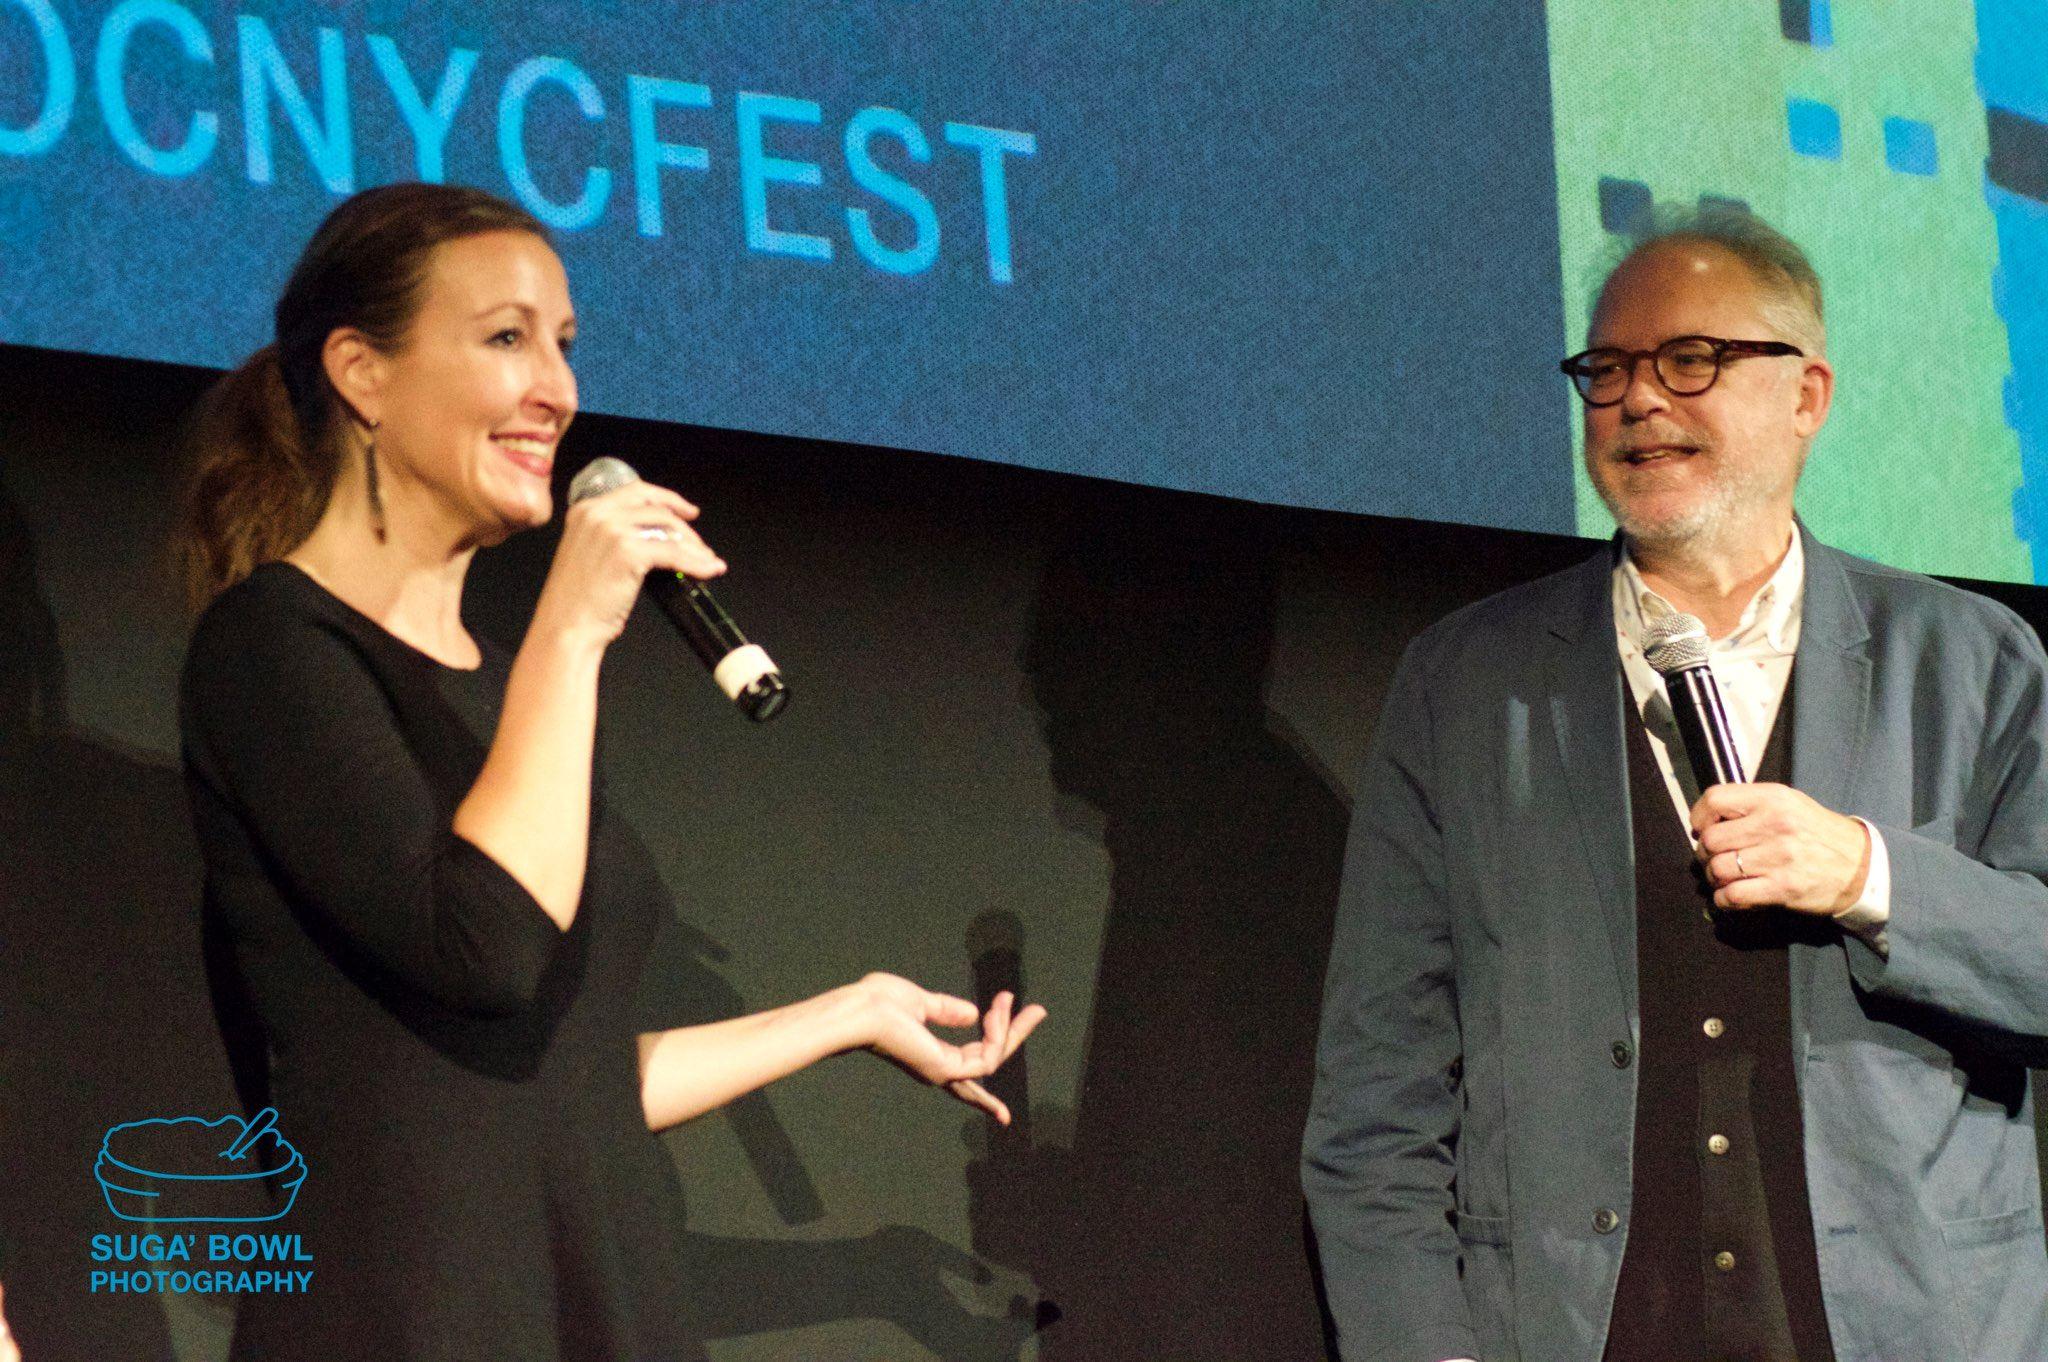 Photo from DOC NYC screening, courtesy of Joyce Jones https://sugainmybowl.org/tag/joyce-jones/